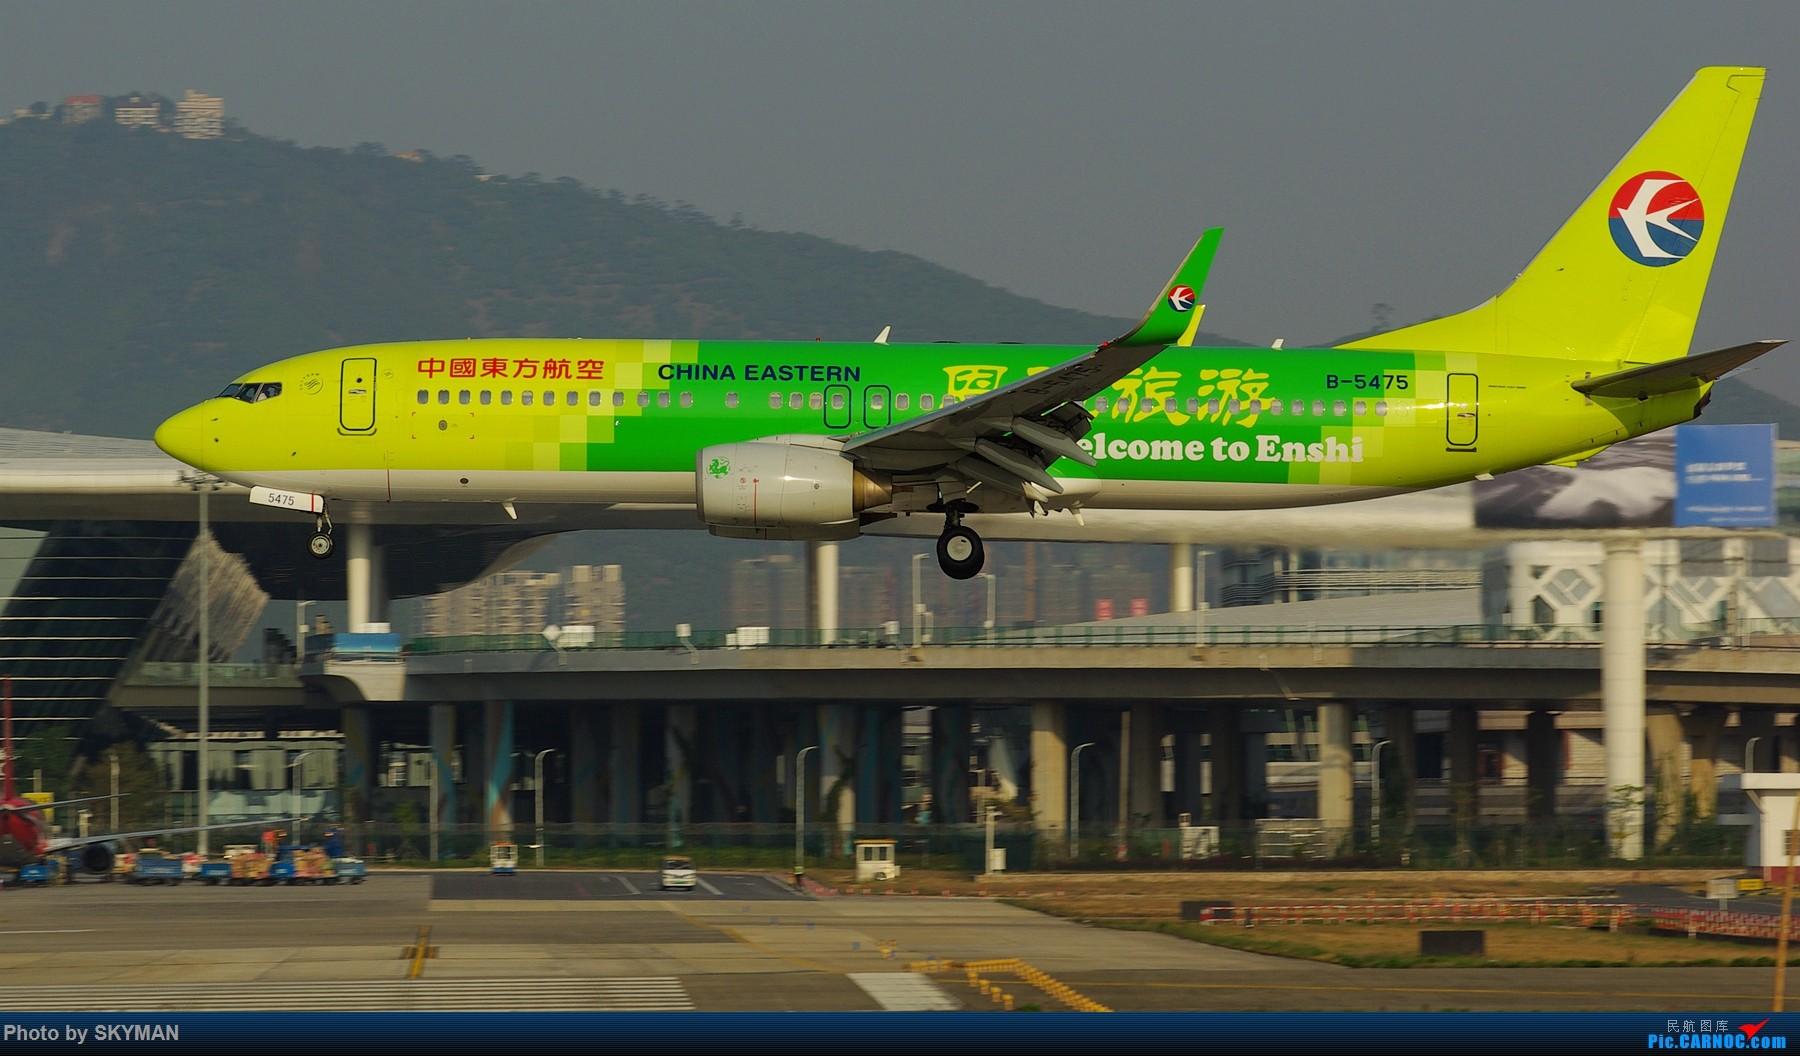 Re:[原创]BLDDQ---内痕么 以目前的形式靠打工实在是揭不开锅了 各位爷列为亲看着意思点啊 别控制 可是今天下午刚出炉的 绝对新鲜热乎 BOEING 737-800 B-5475 中国深圳宝安国际机场